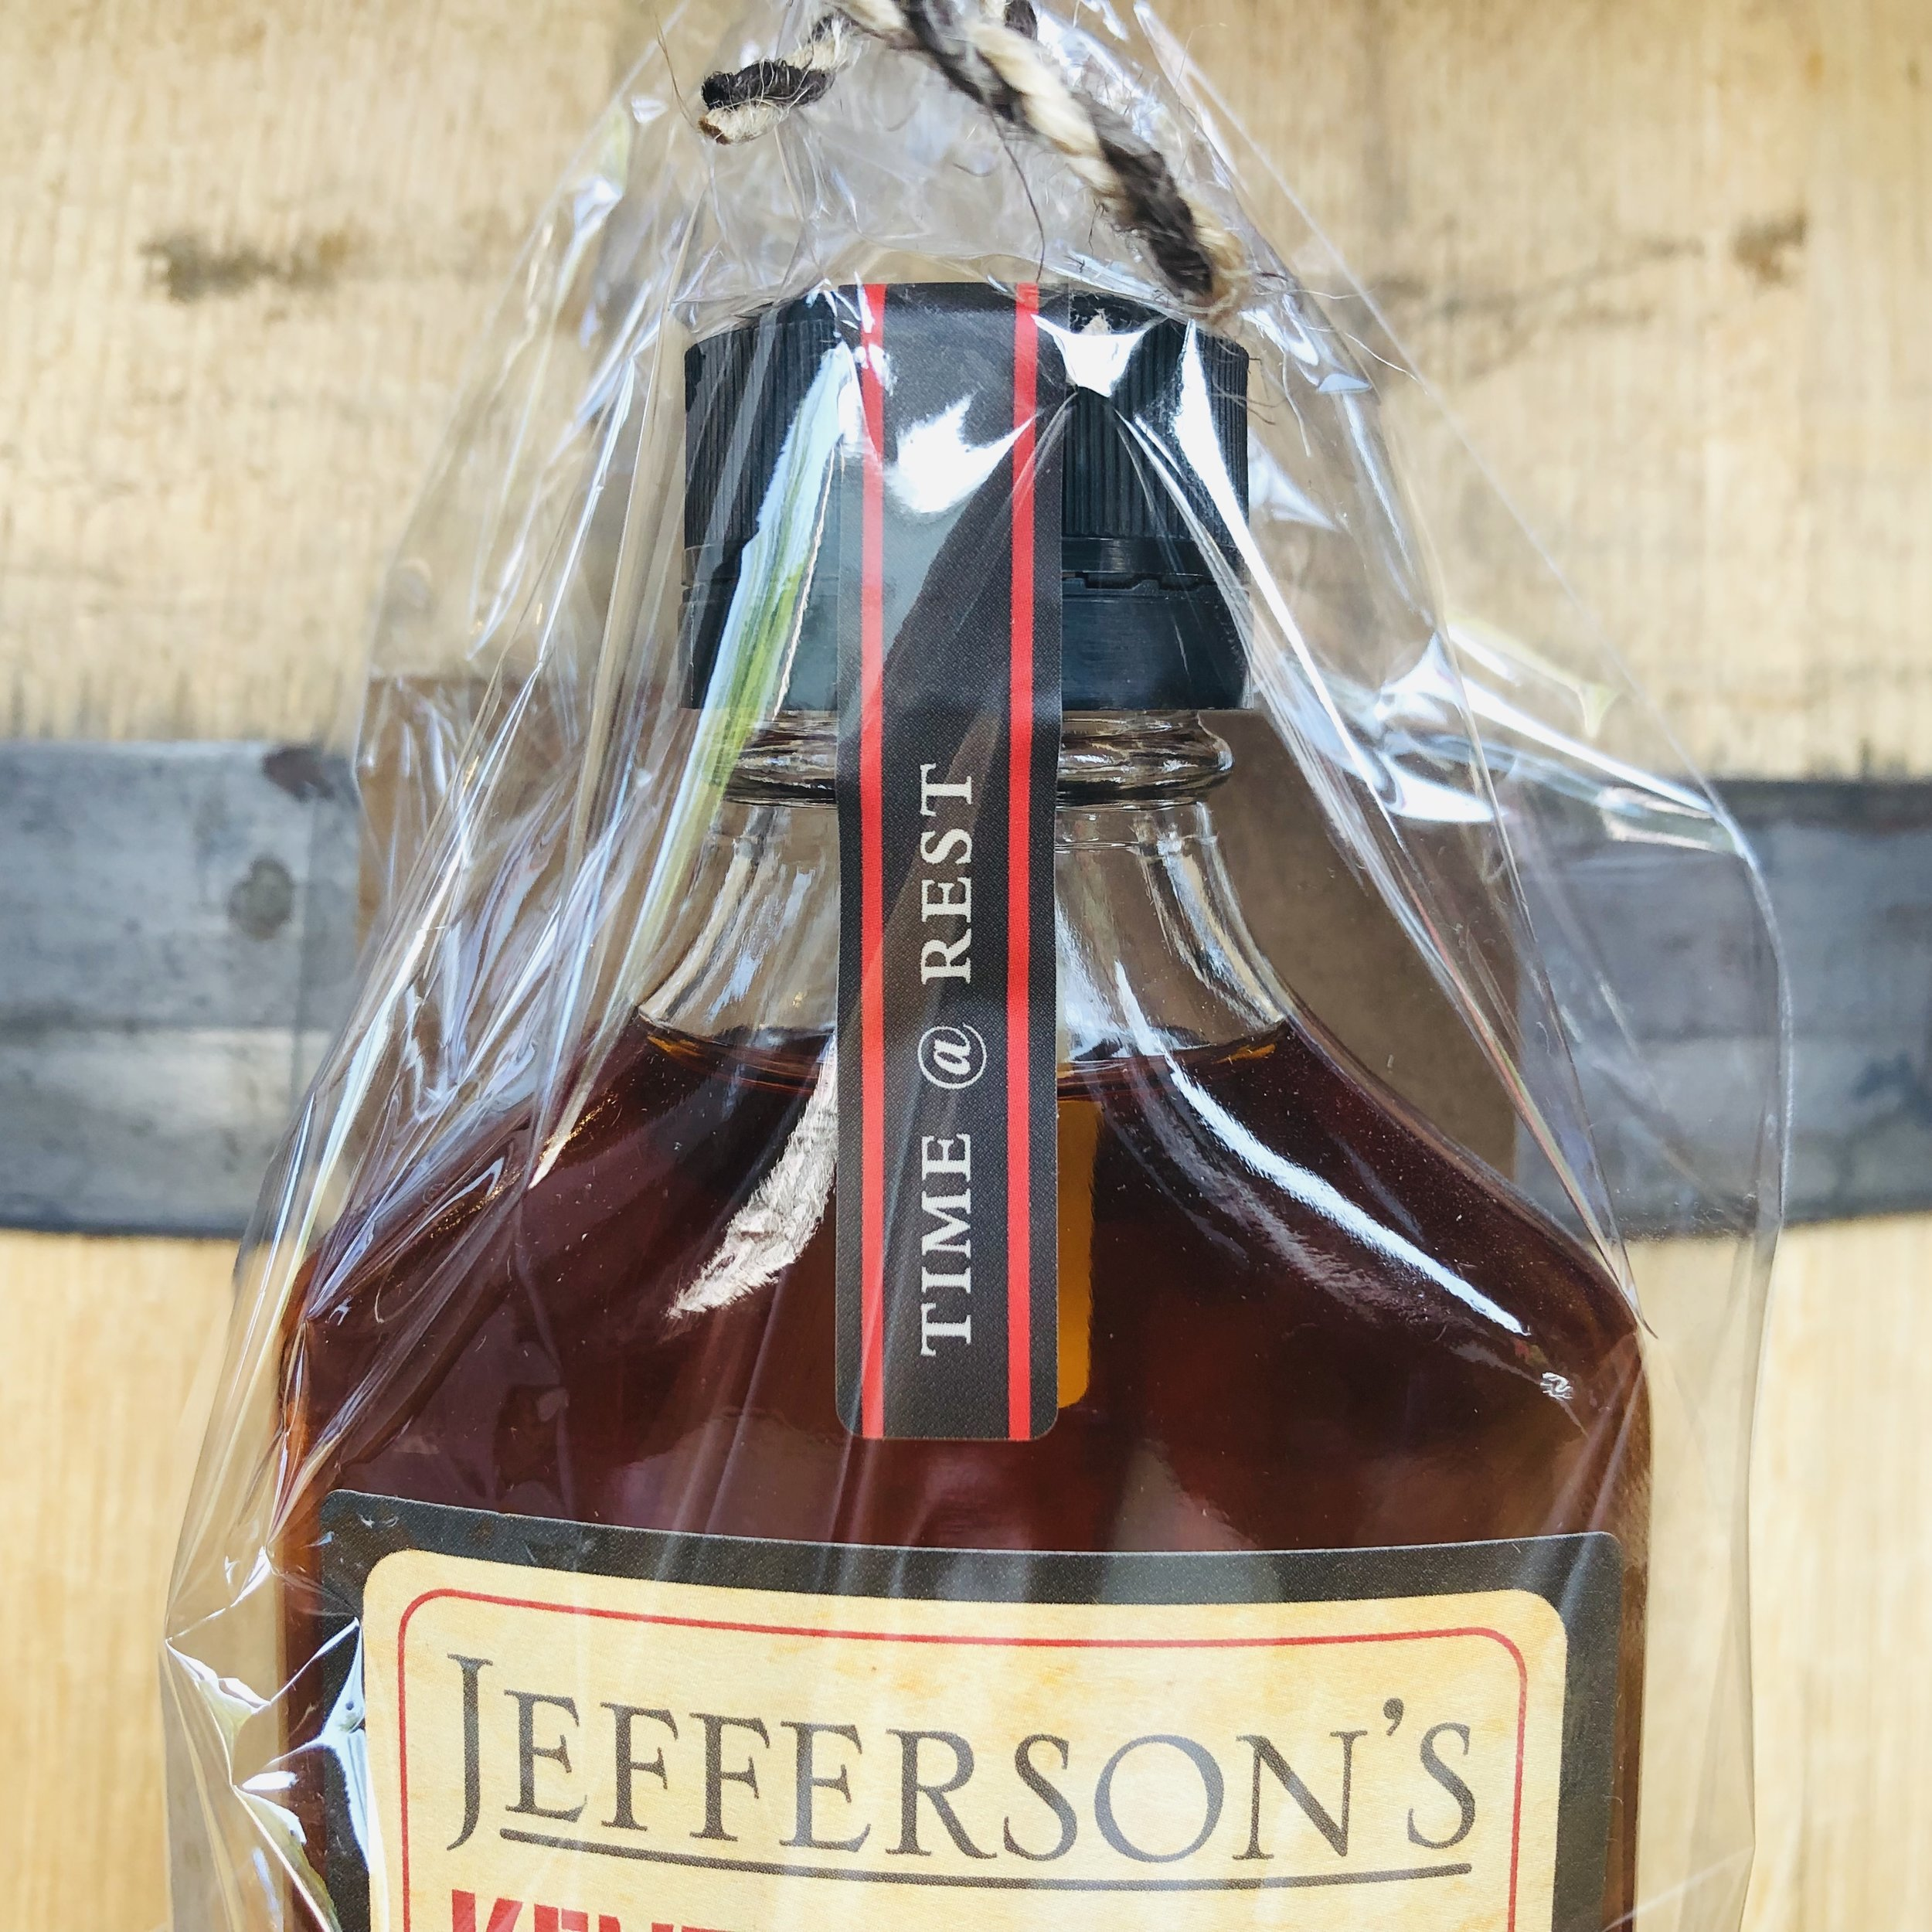 bourbon-jeffersons-02.jpg